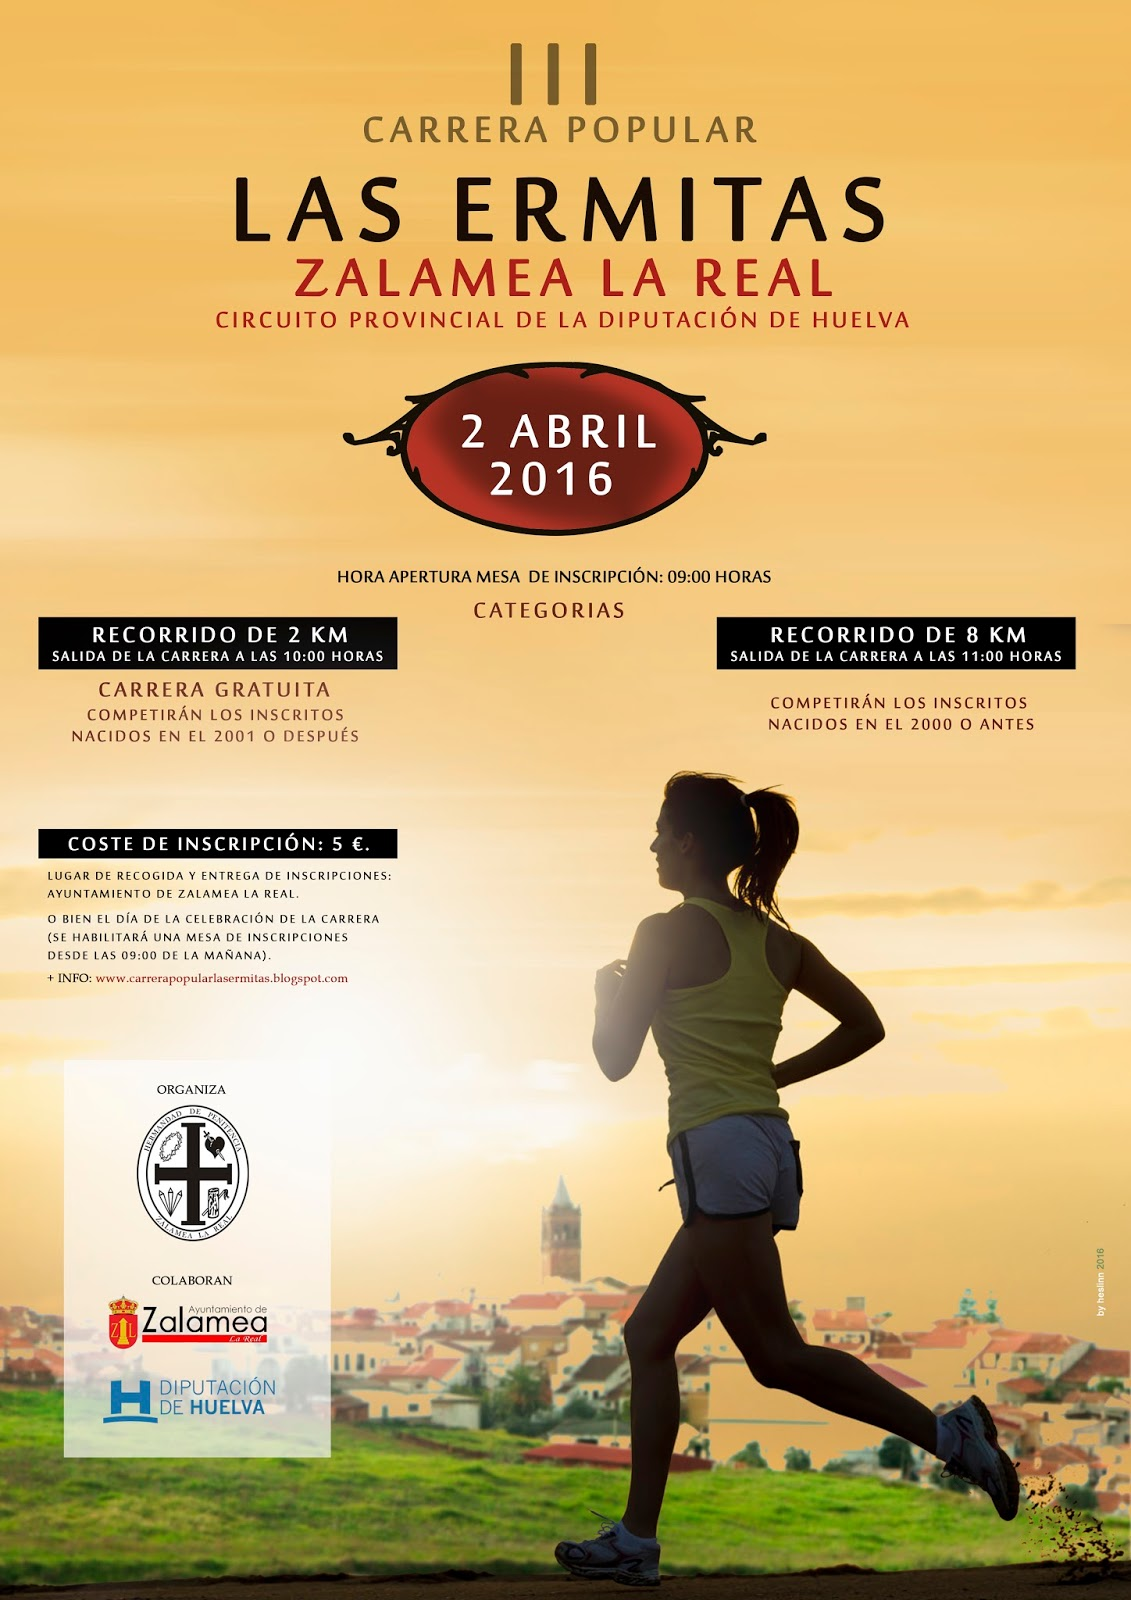 III Carrera Popular Ruta de Las Ermitas Zalameñas